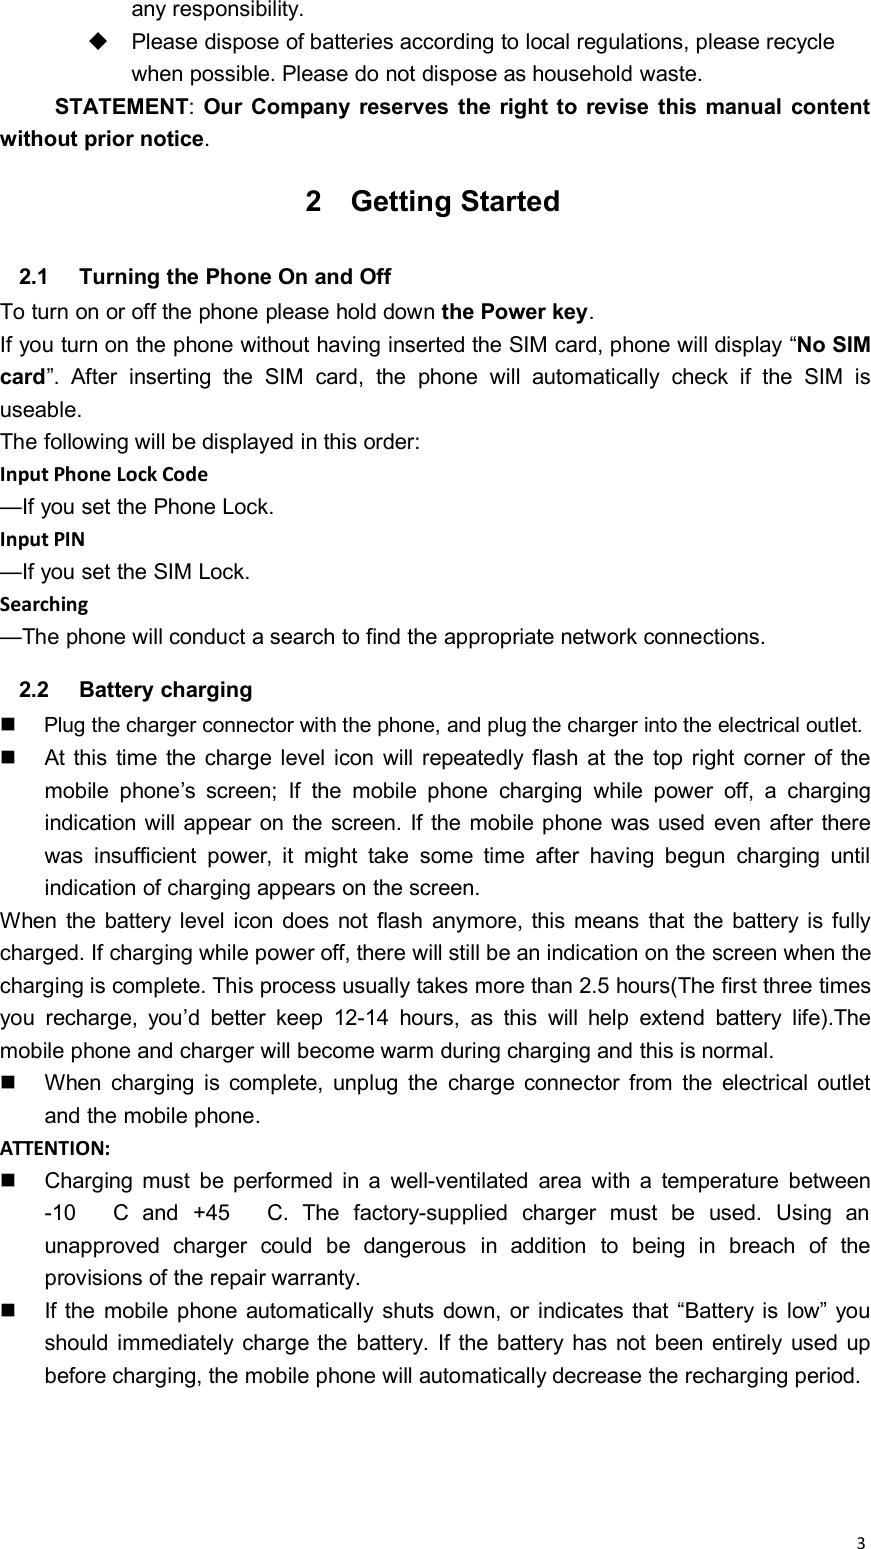 getting into the vortex user guide pdf